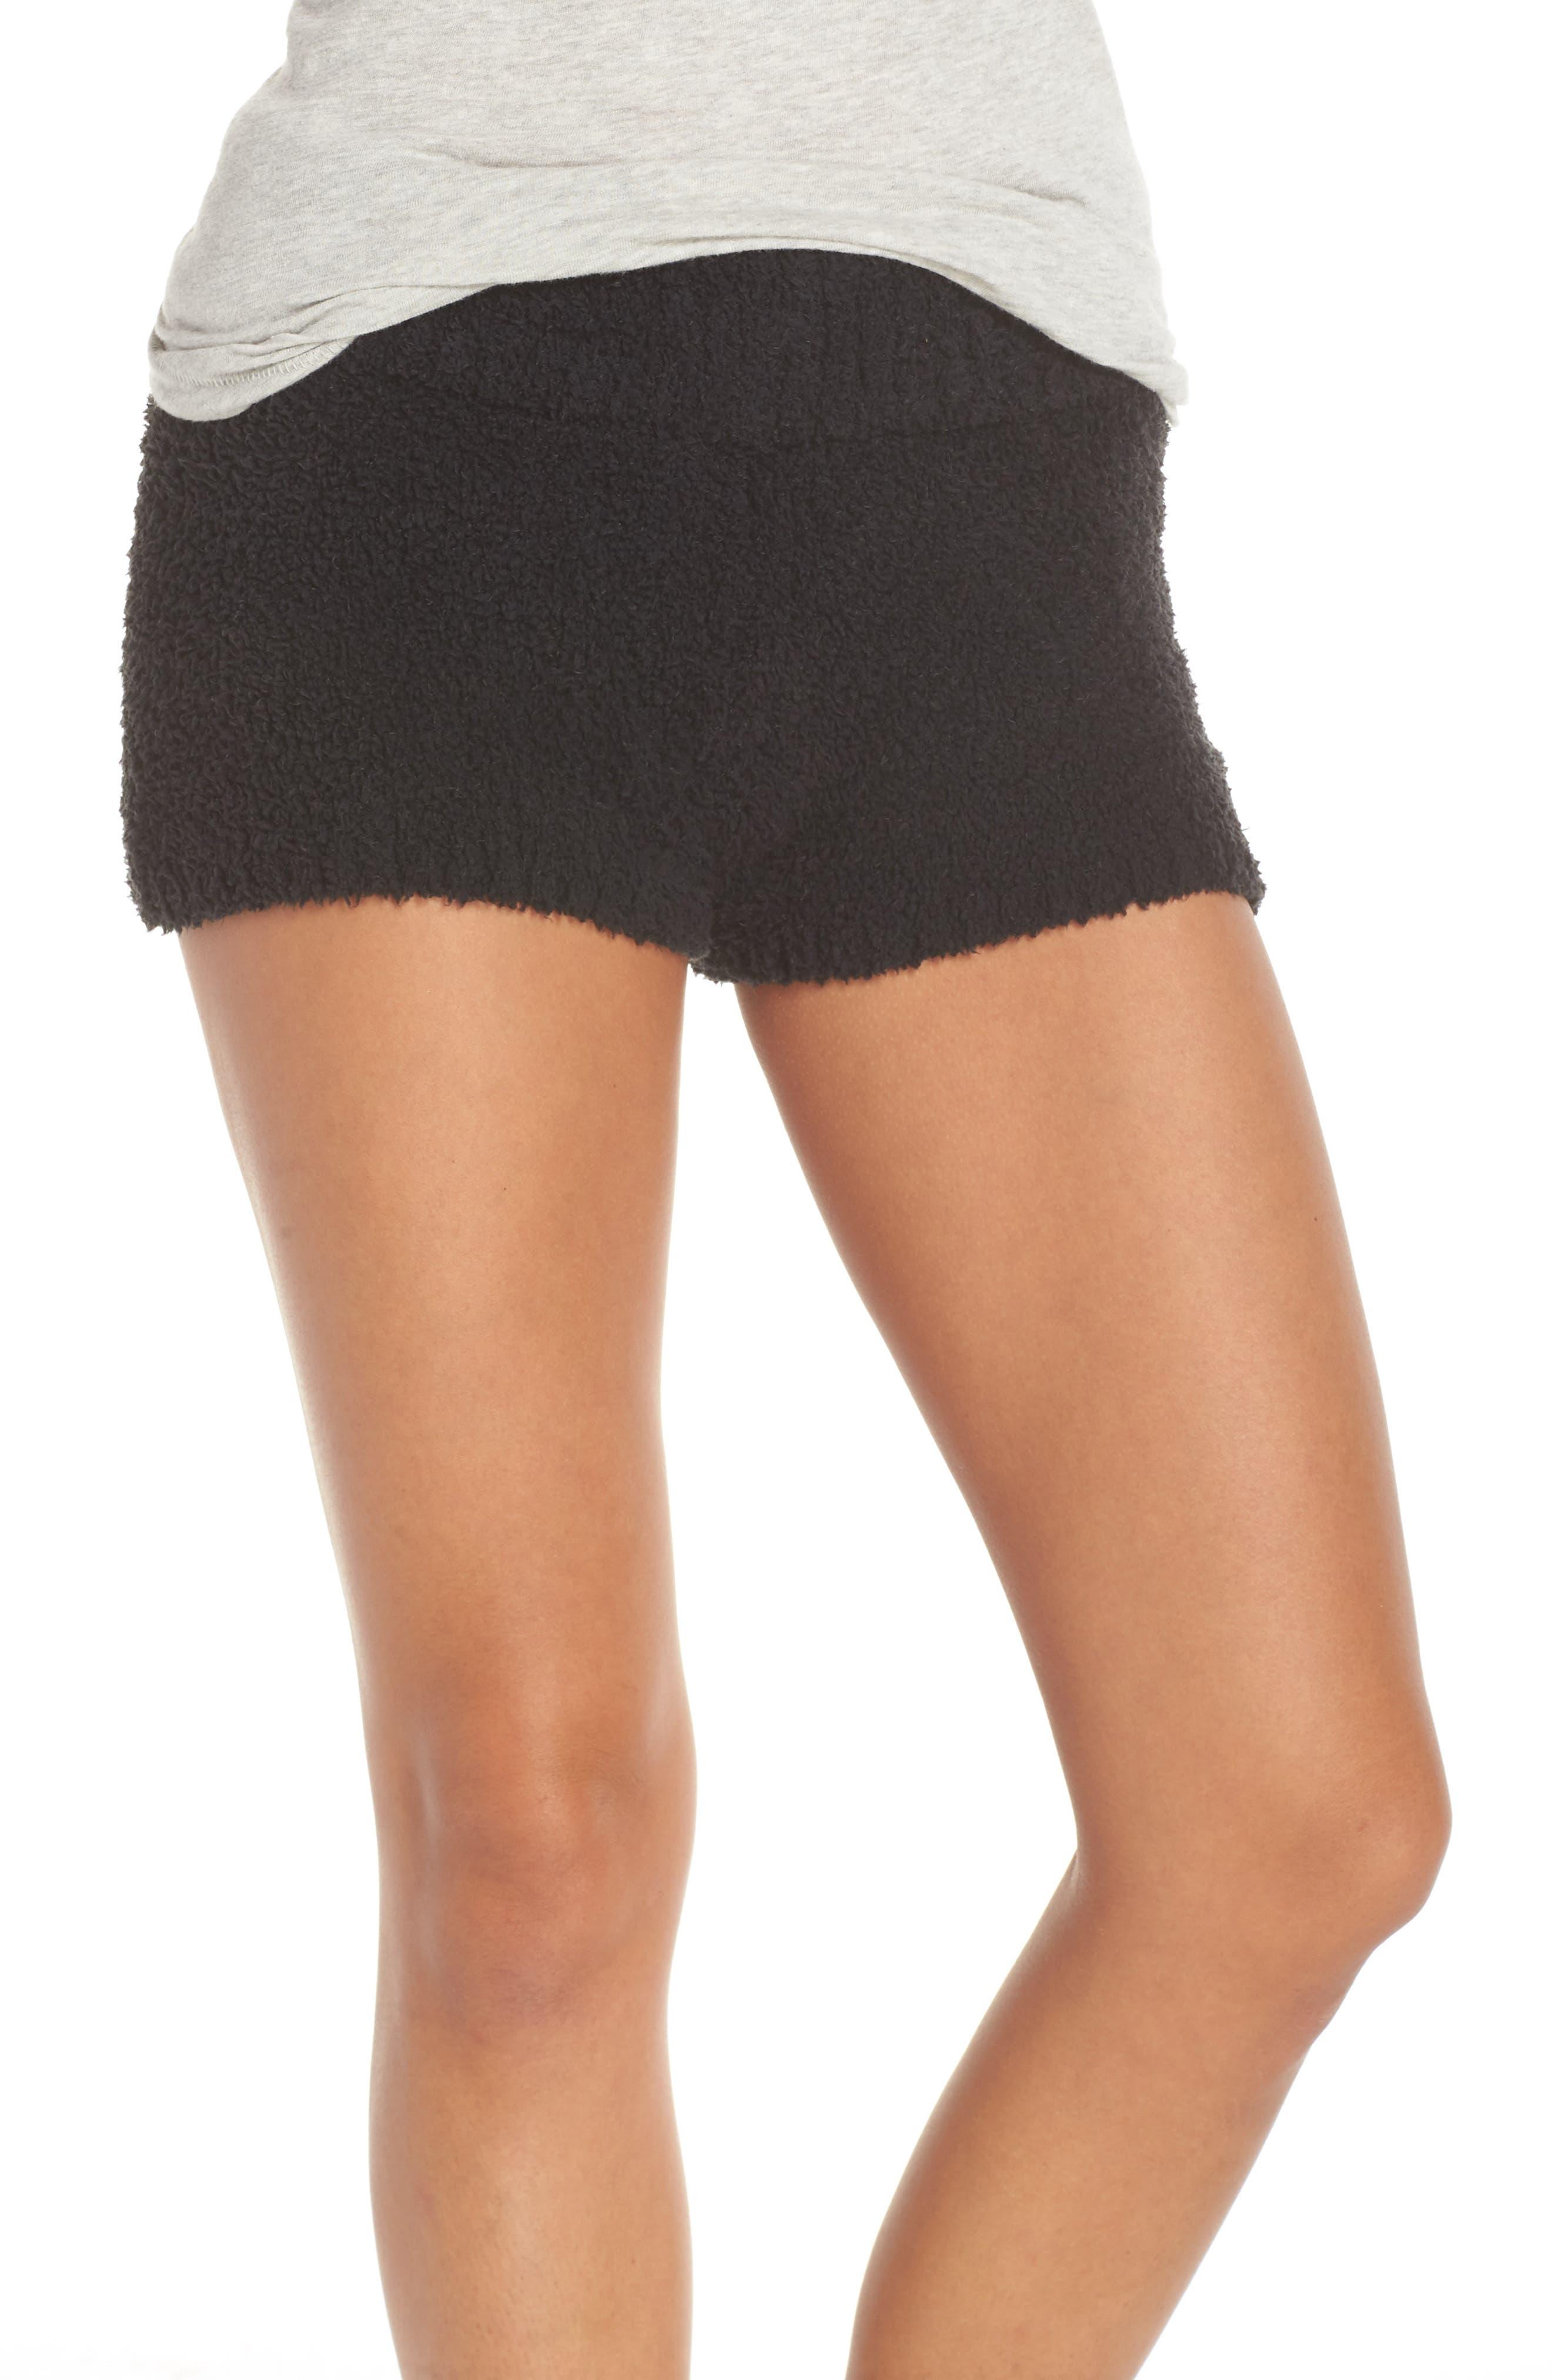 Shilo Shorts,                         Main,                         color, BLACK